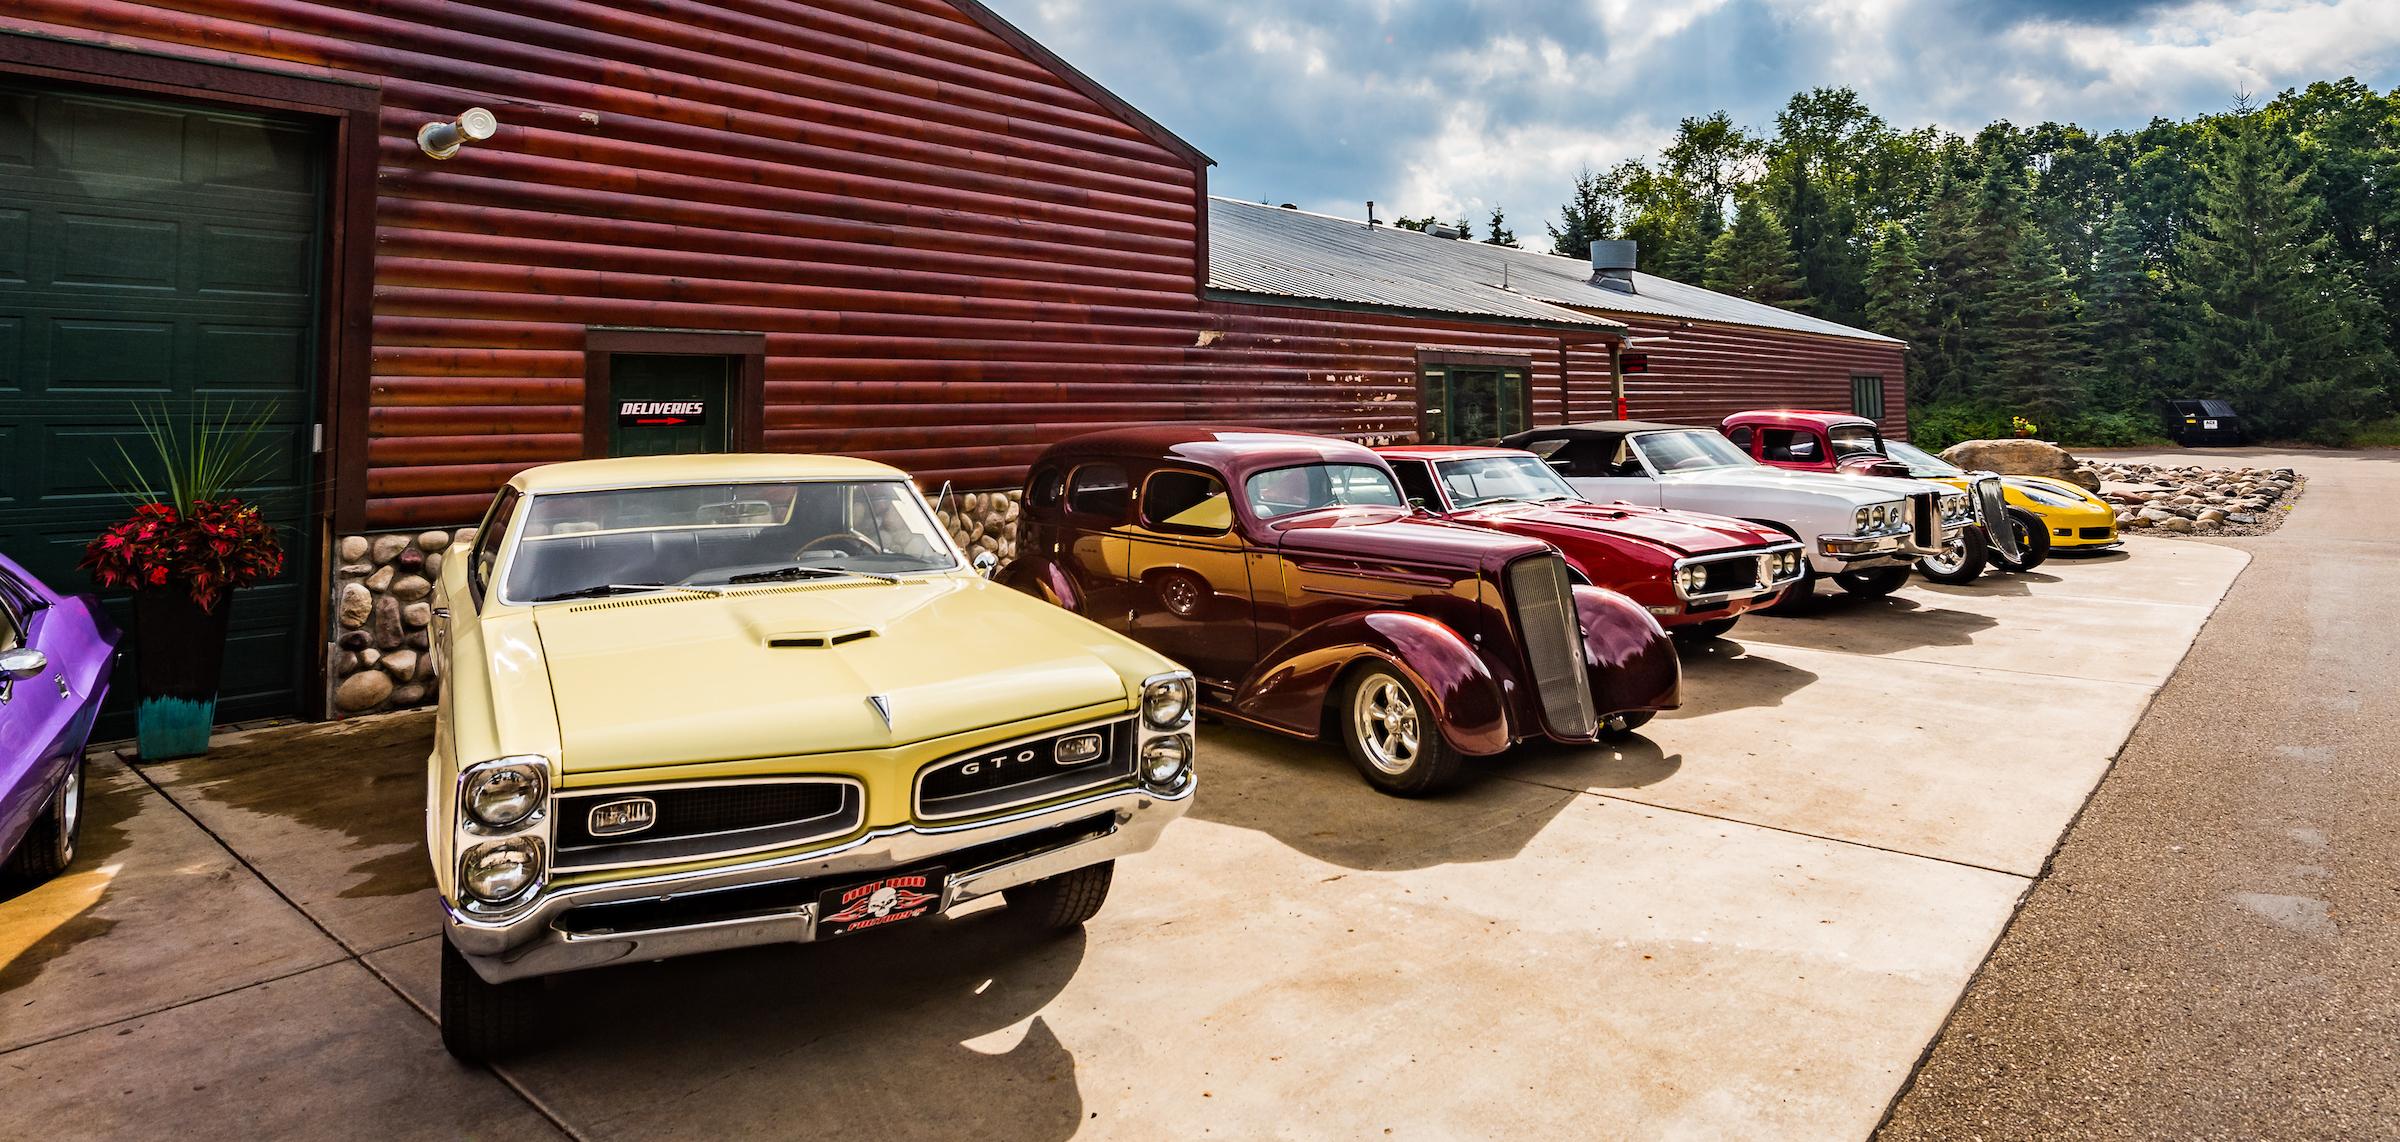 Minnesota Hot Rod Factory Pontiac GTO